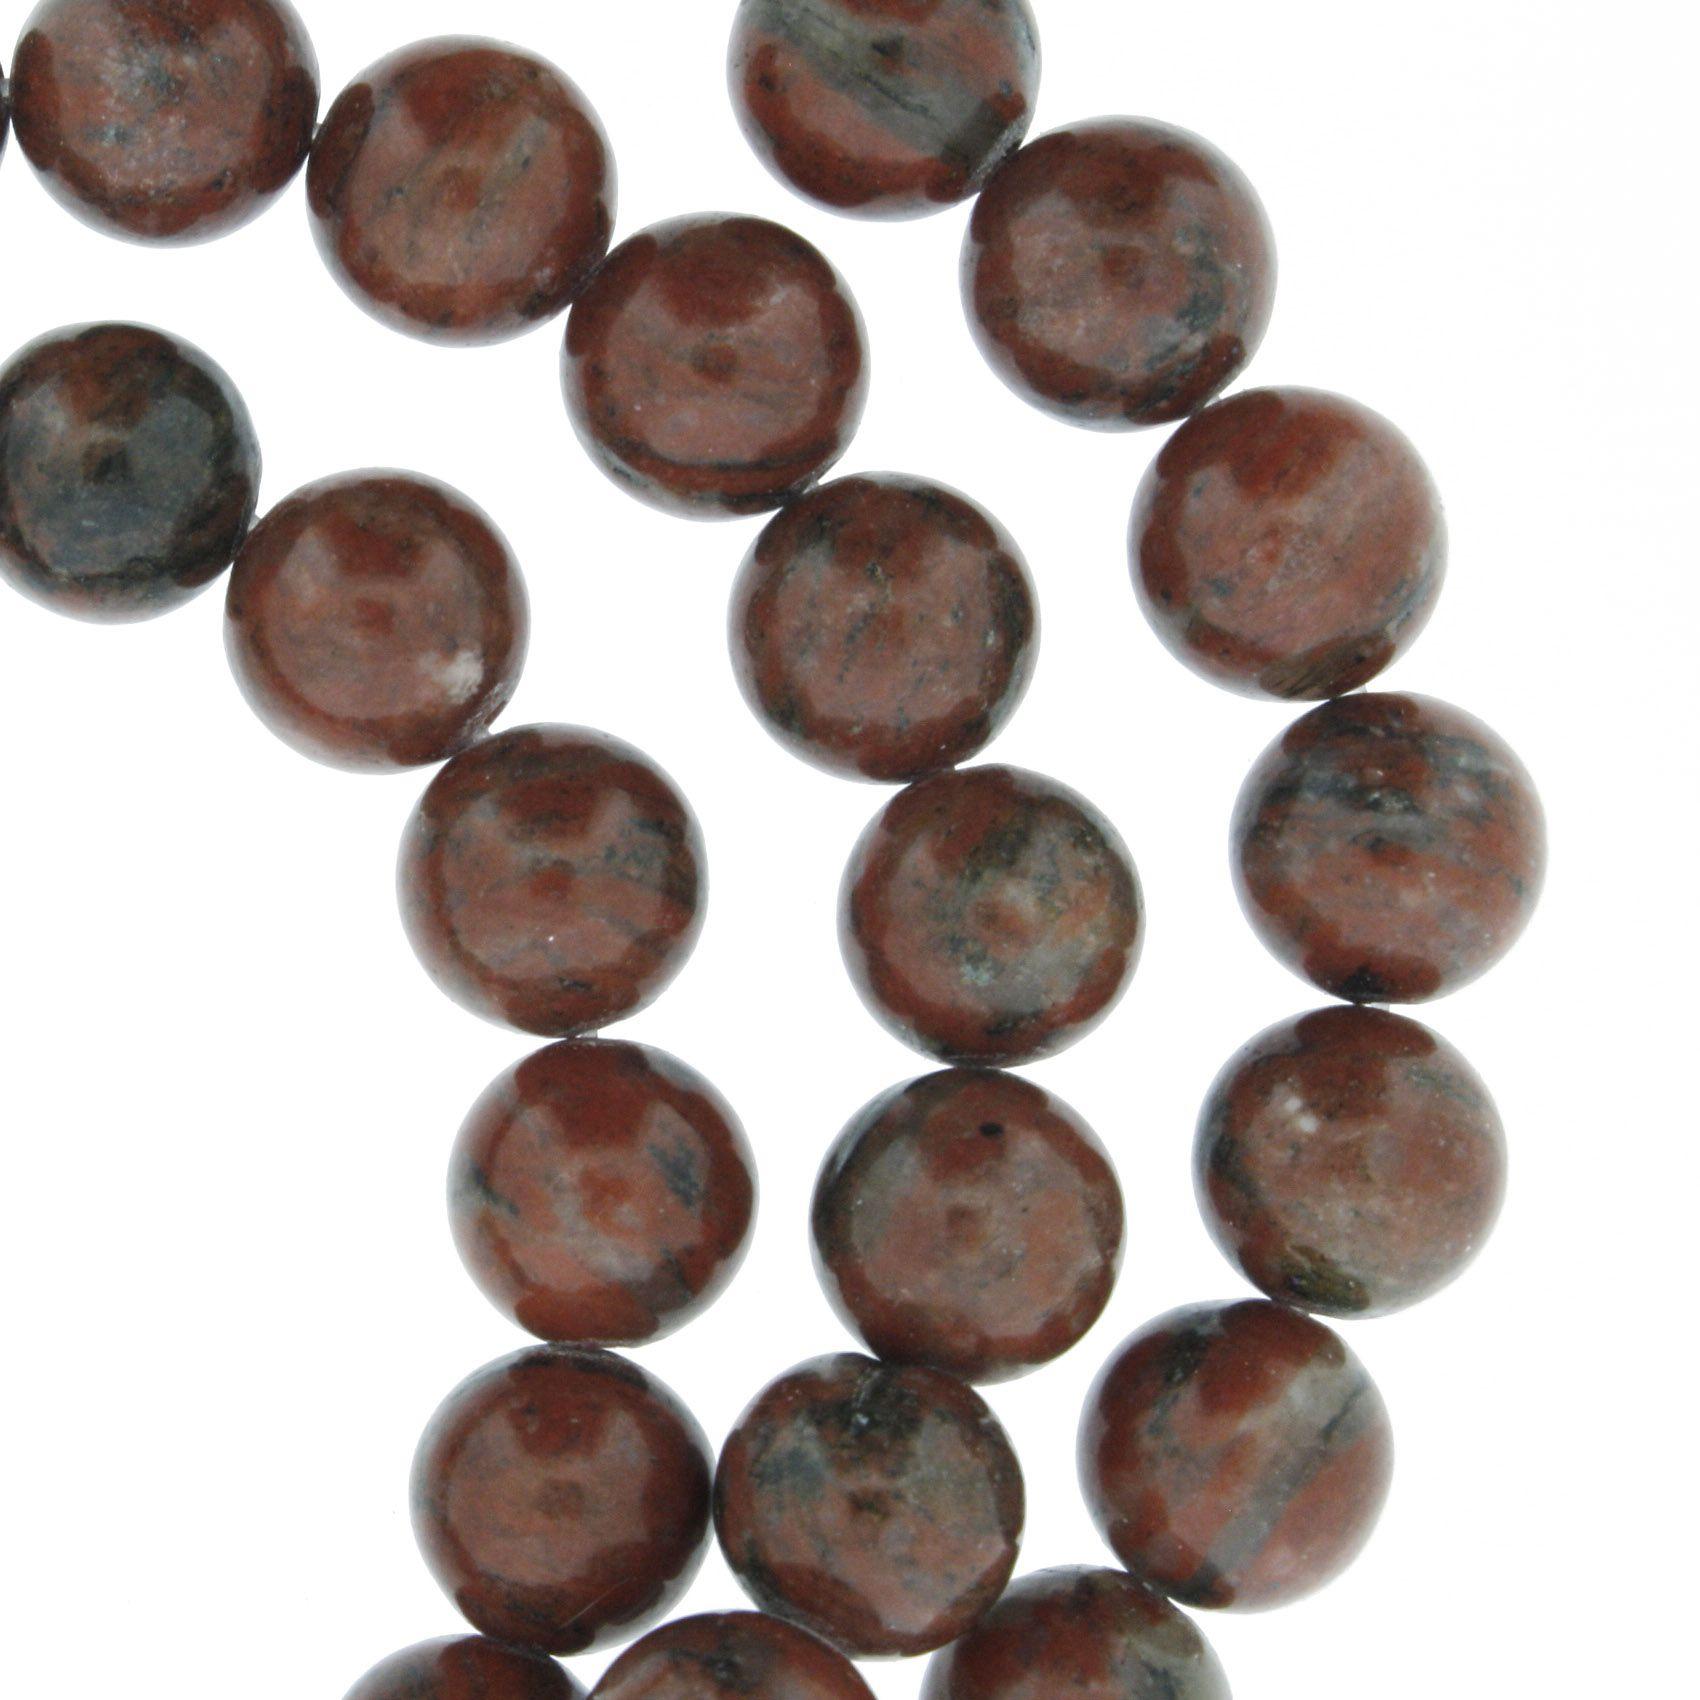 Fio de Pedra - Jaspe Vermelha - 8mm  - Stéphanie Bijoux® - Peças para Bijuterias e Artesanato